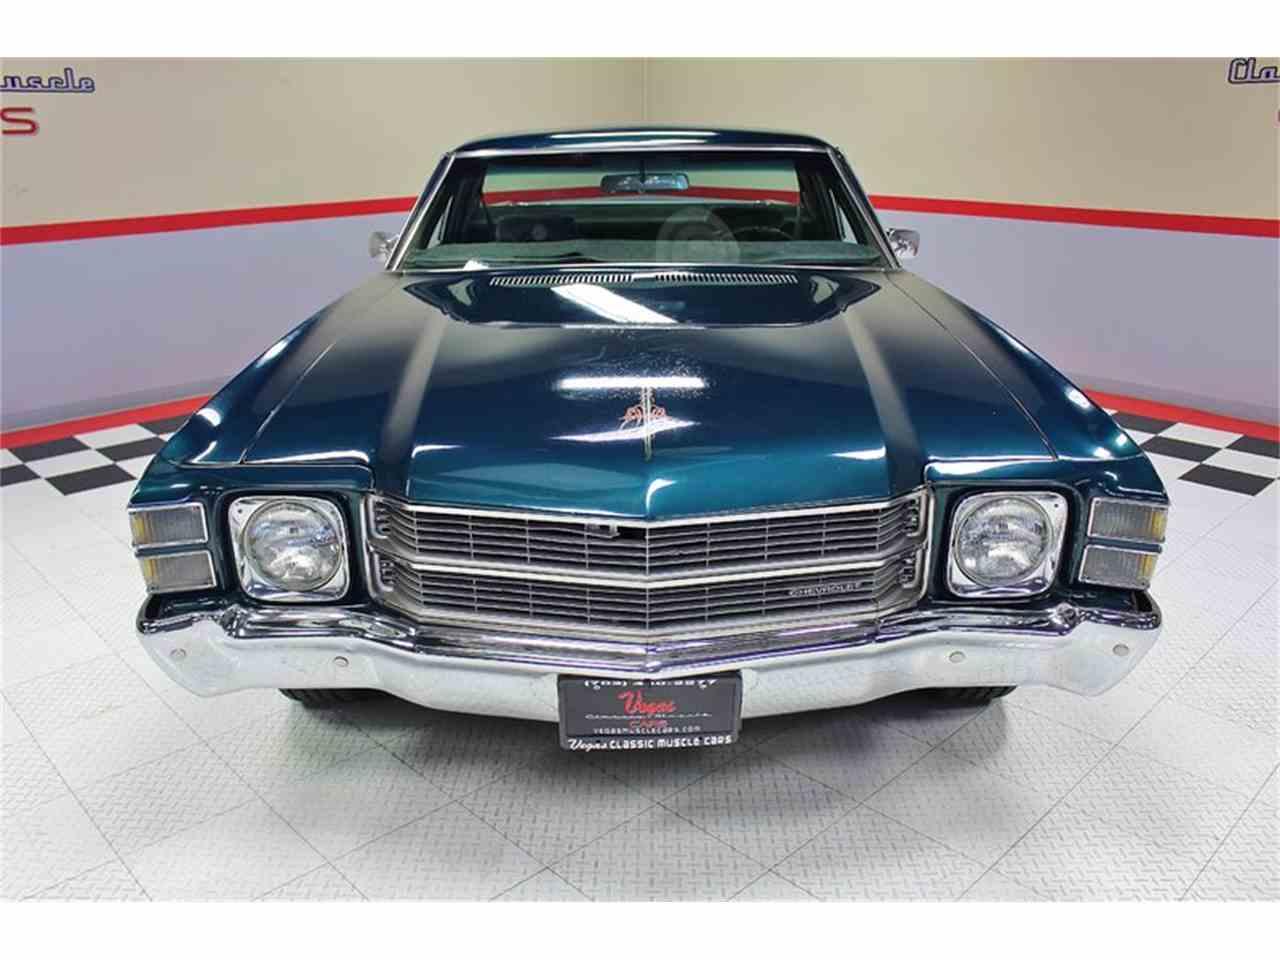 1971 Chevrolet El Camino for Sale | ClassicCars.com | CC-973744